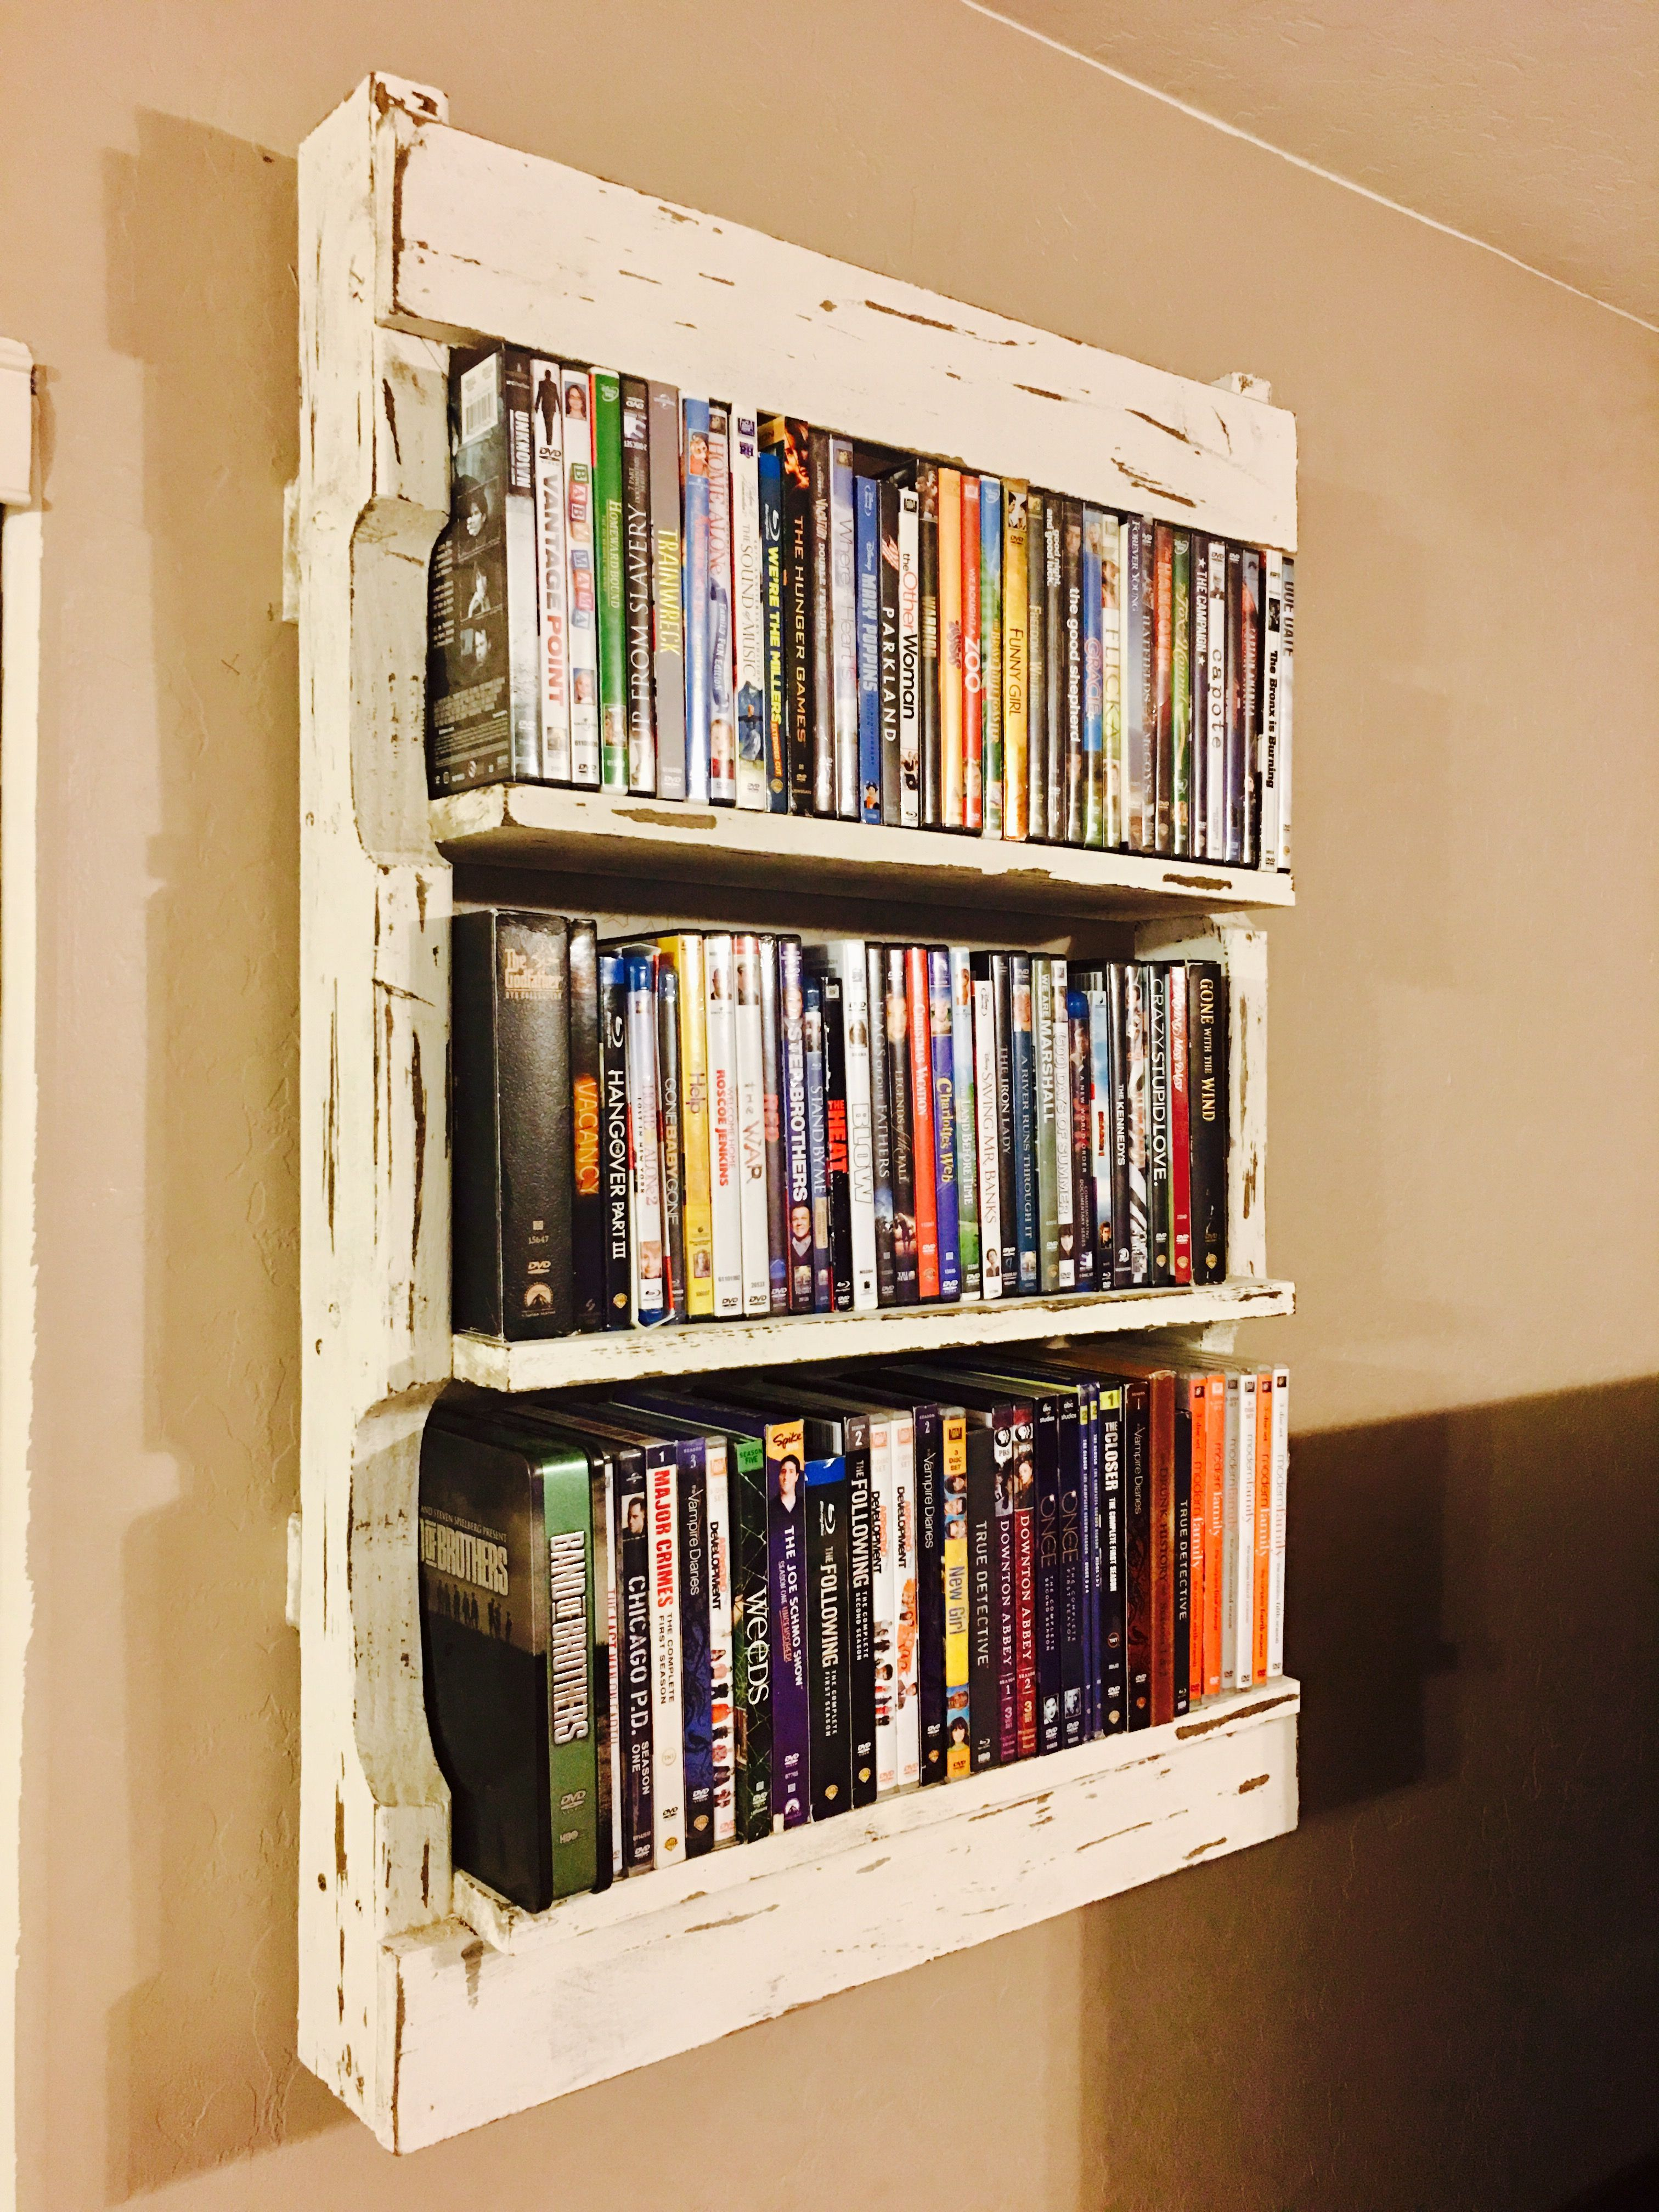 Diy Rustic Wall Pallet Shelves For Dvd S Easy Under 30